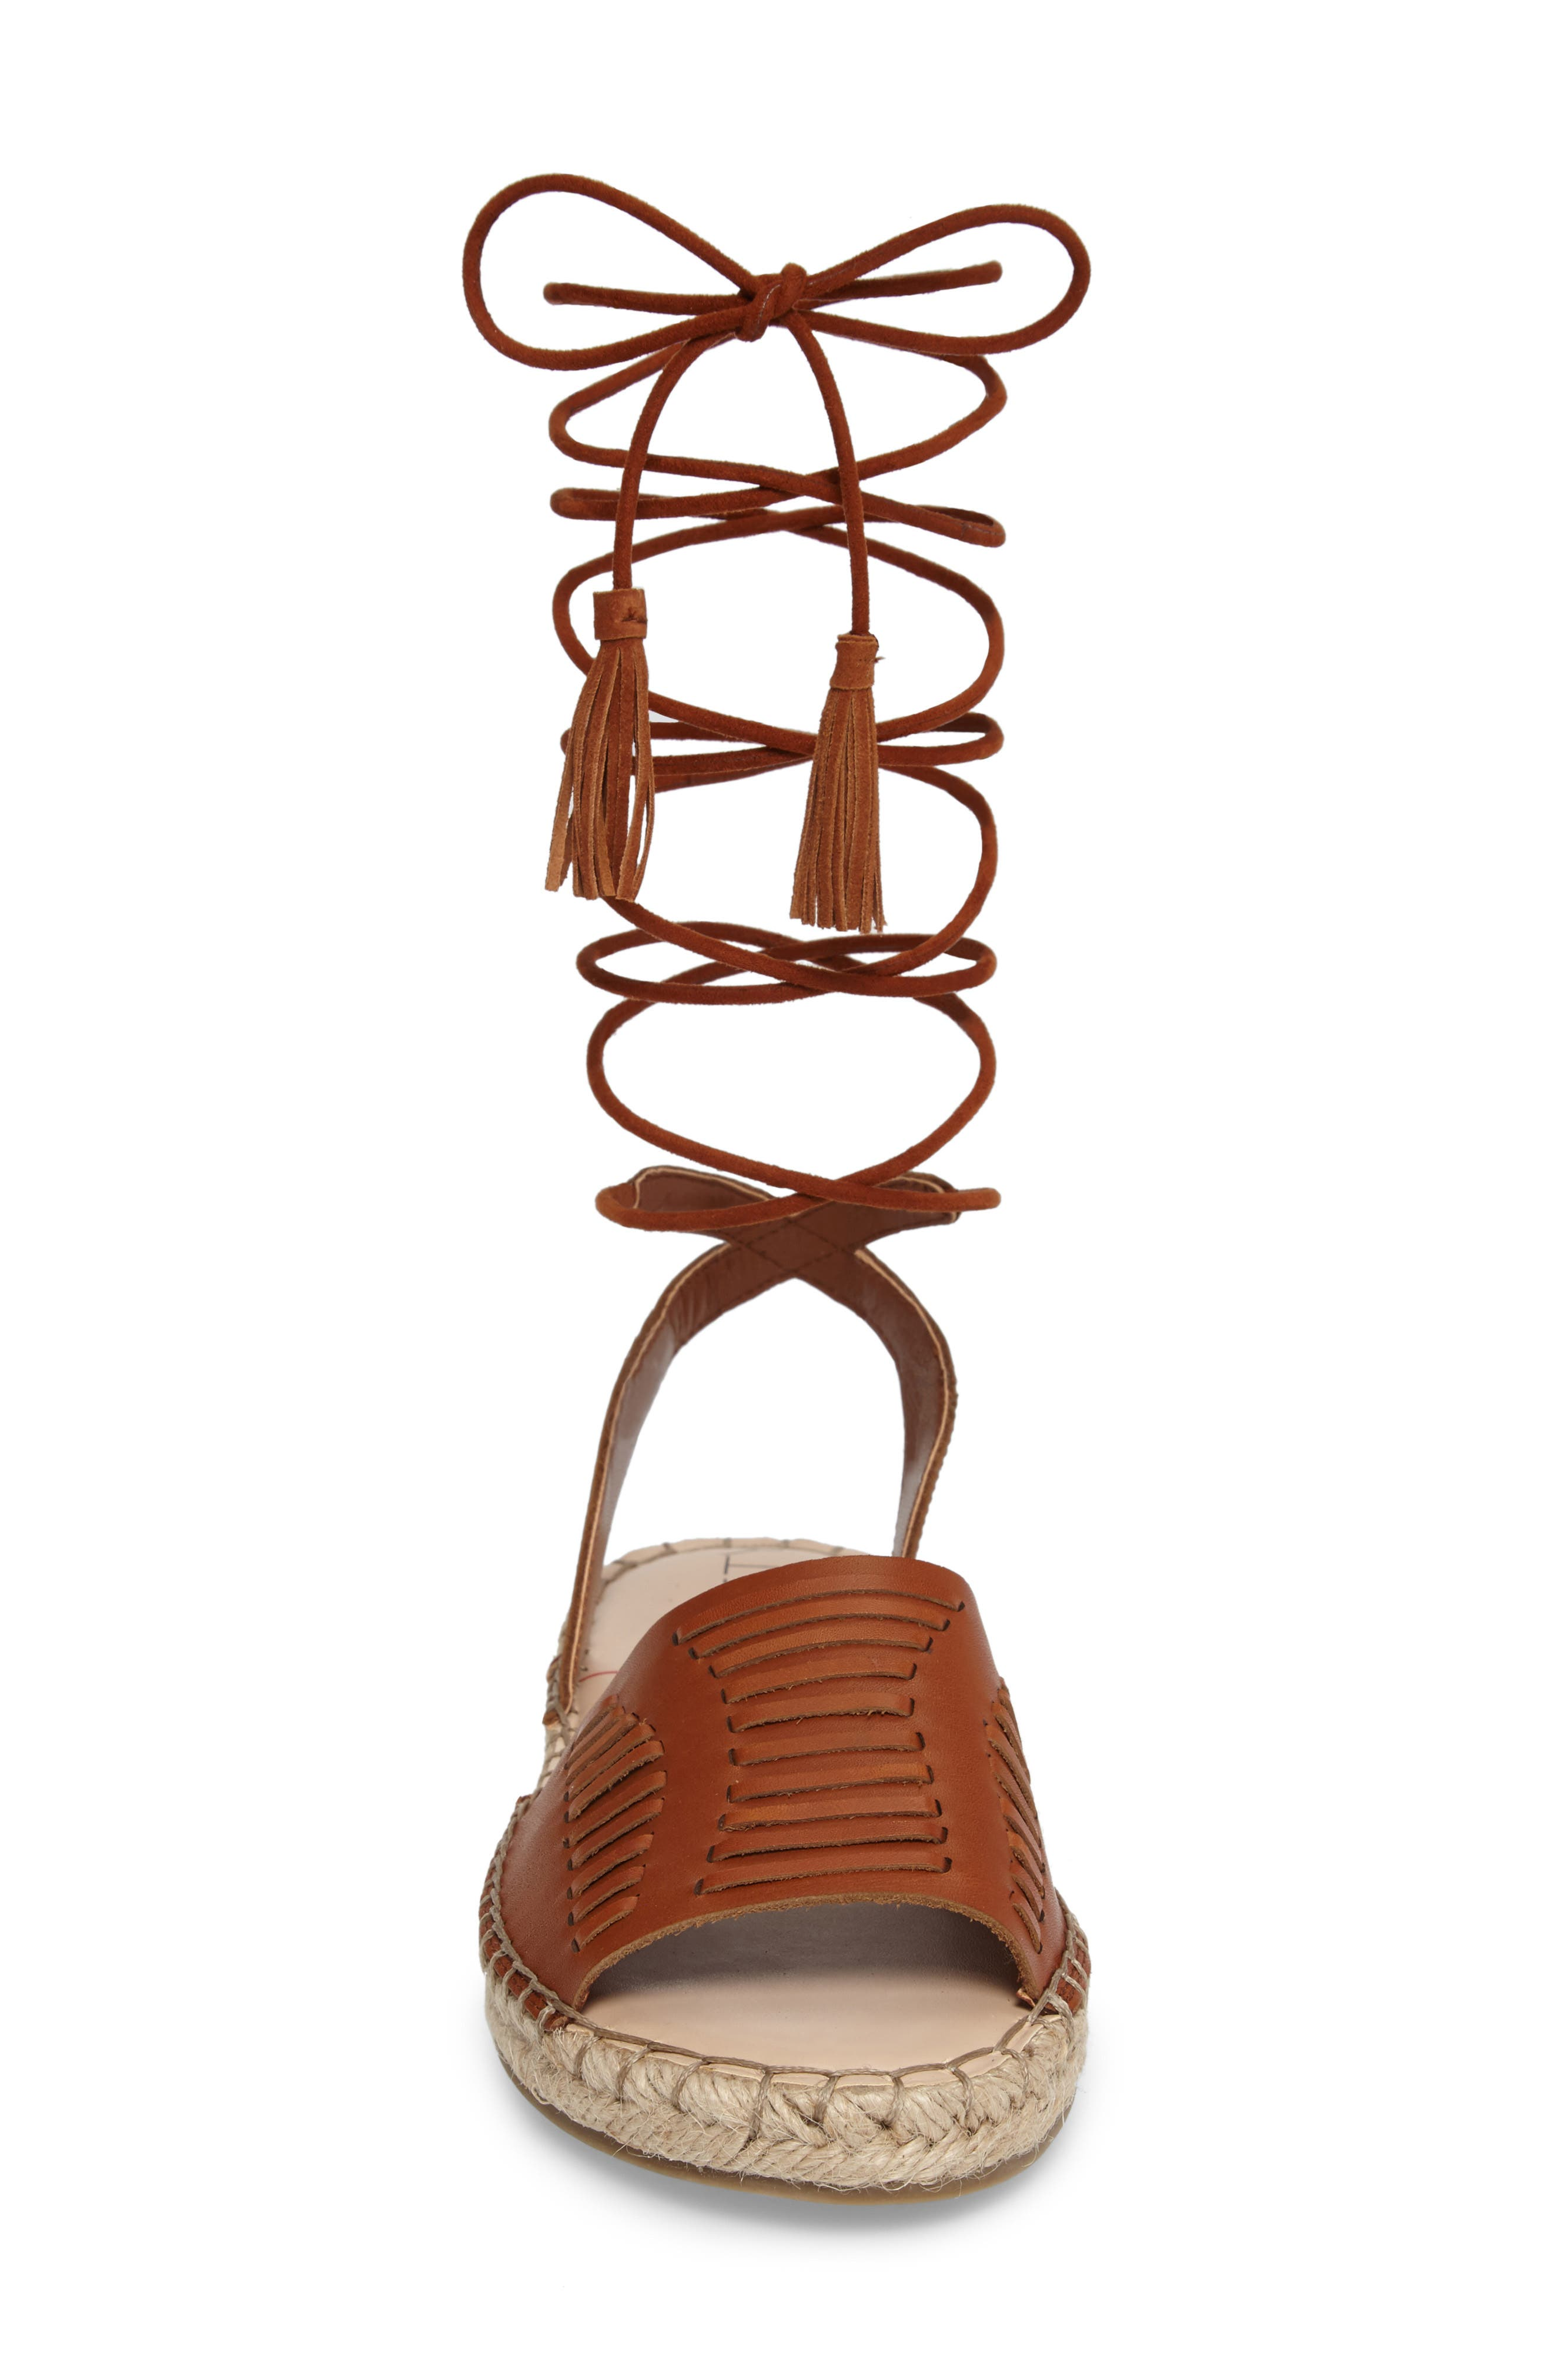 Clover Ankle Wrap Espadrille Sandal,                             Alternate thumbnail 4, color,                             212